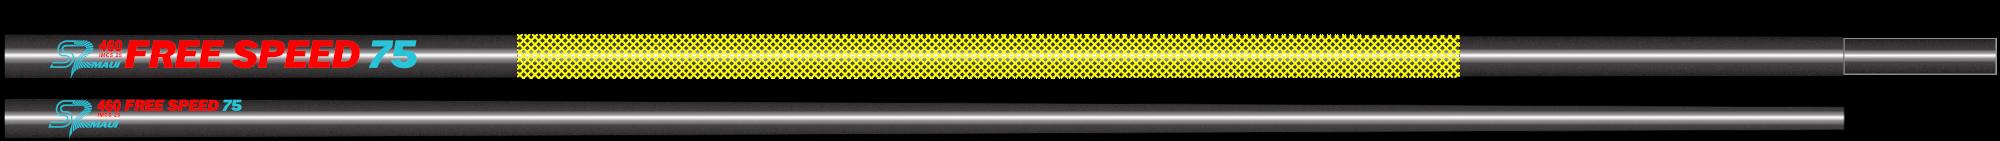 S2 Maui Freespeed 75 Mast SDM (2020)